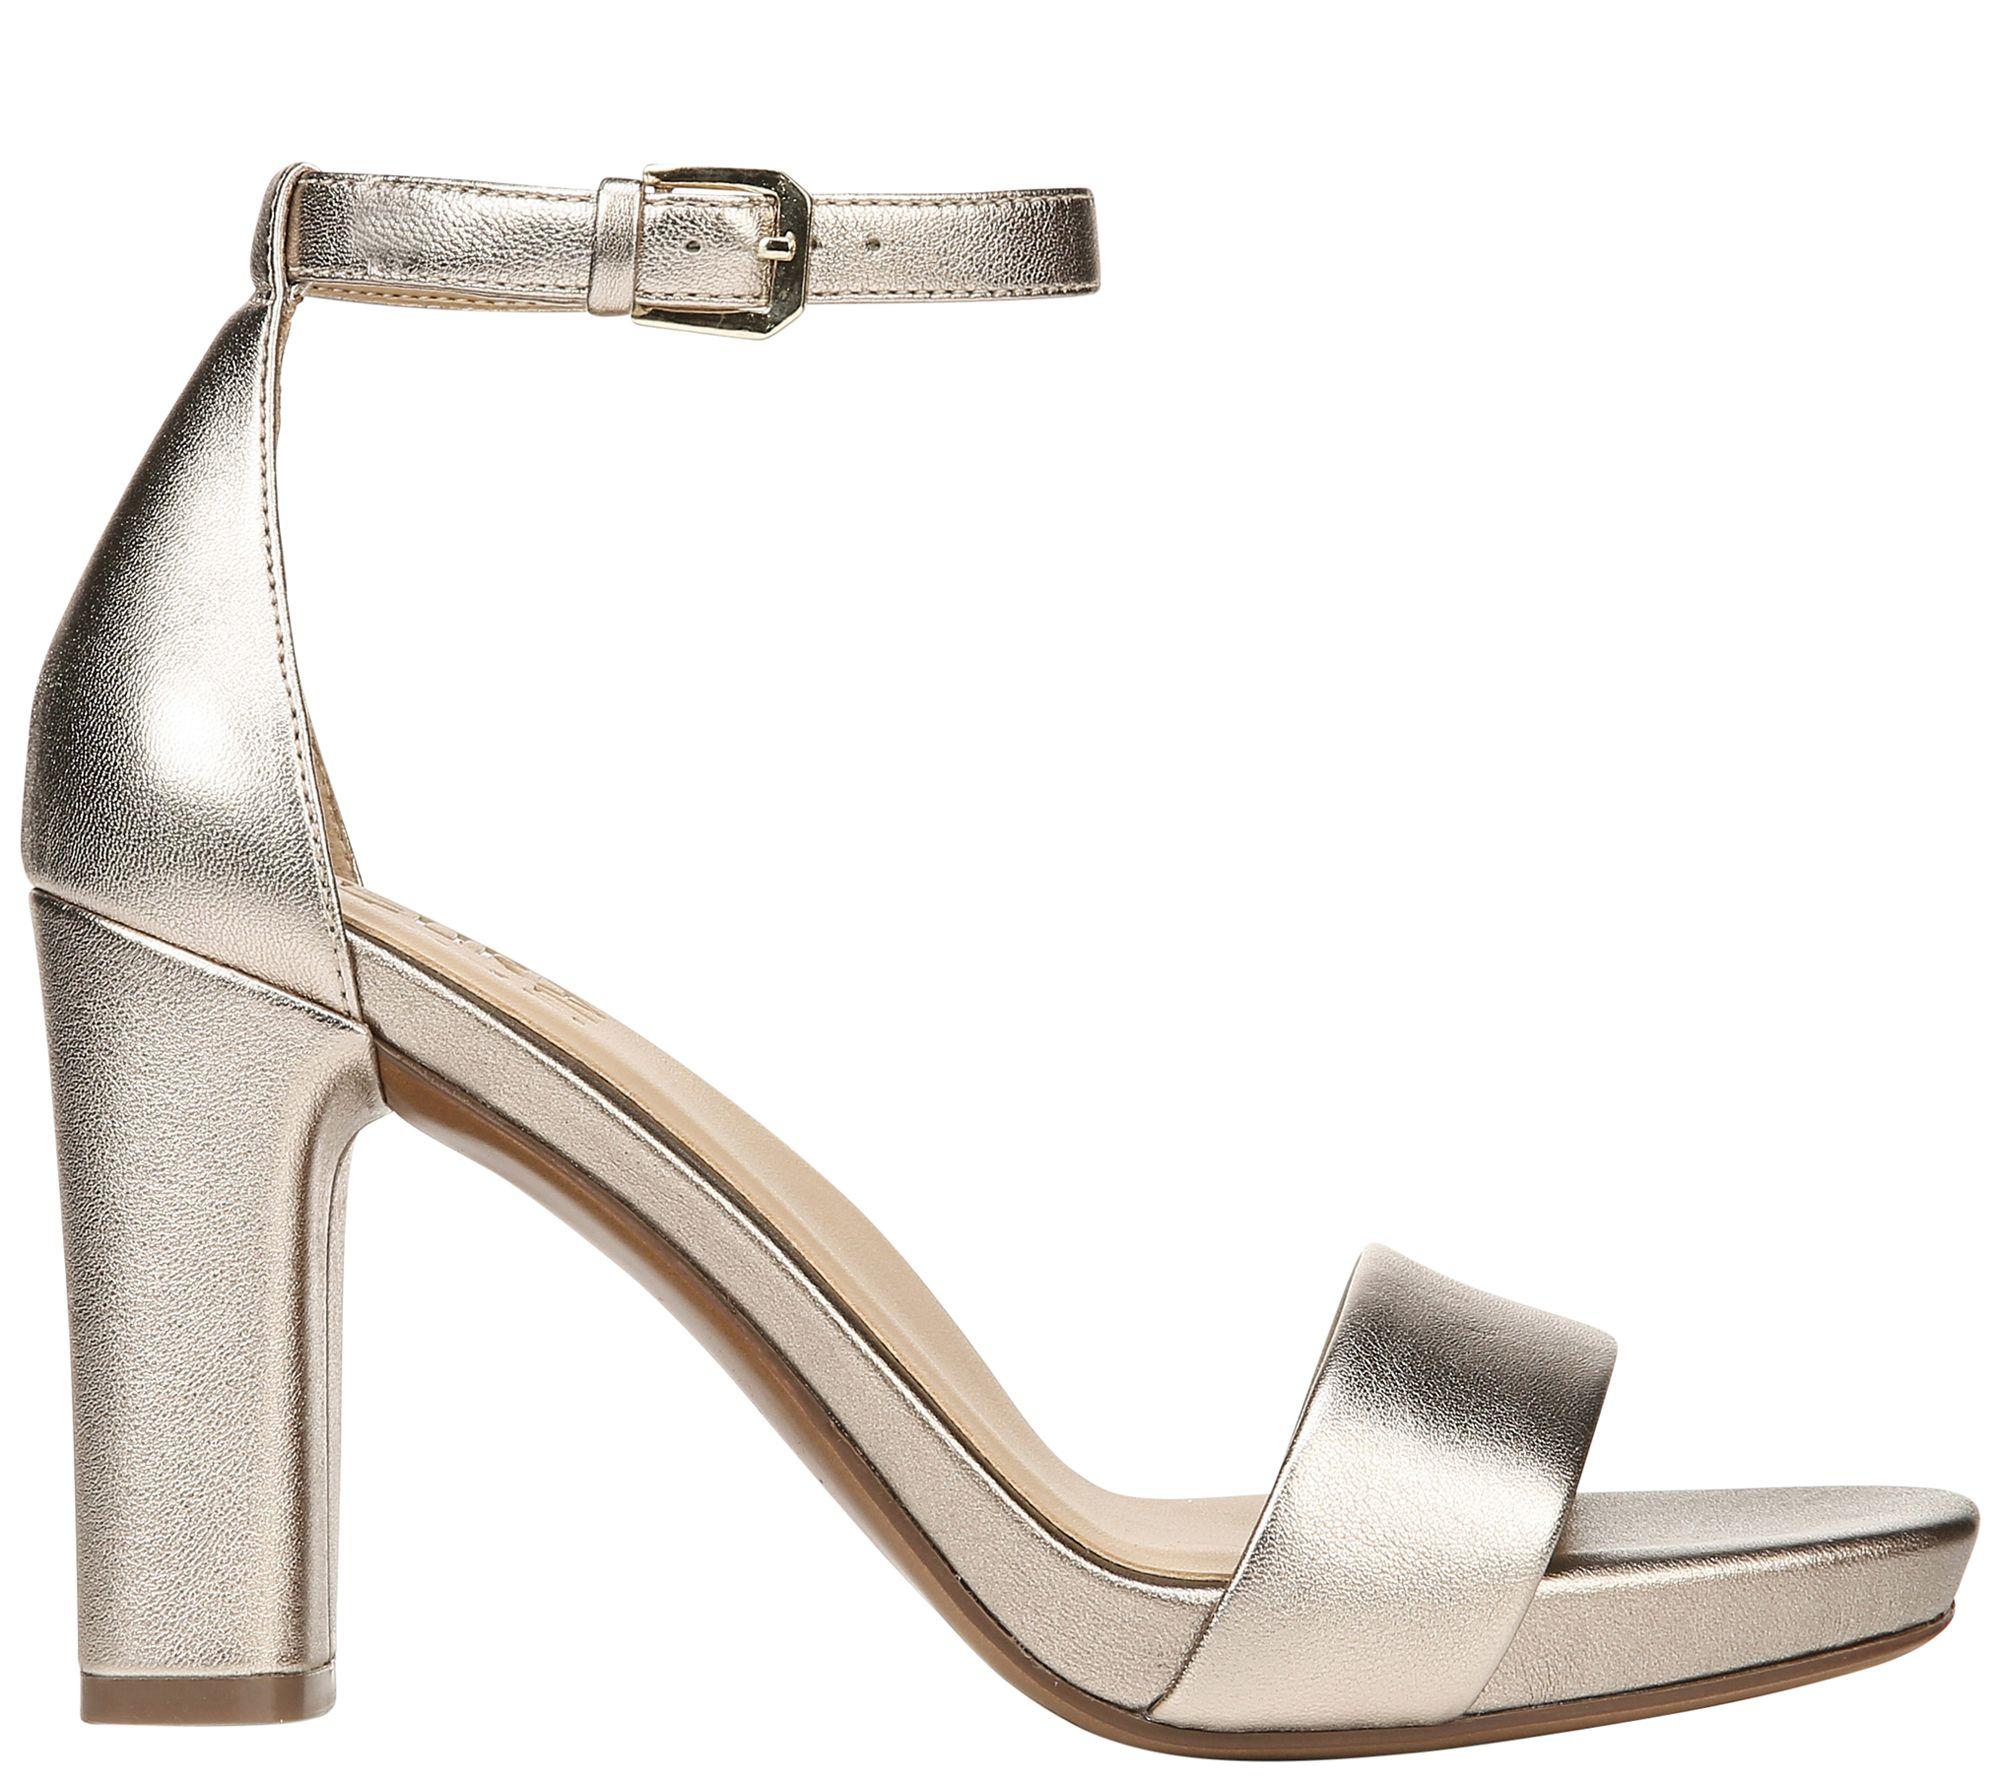 08e98dc9f6 Naturalizer High Heel Platform Sandals - Joy — QVC.com